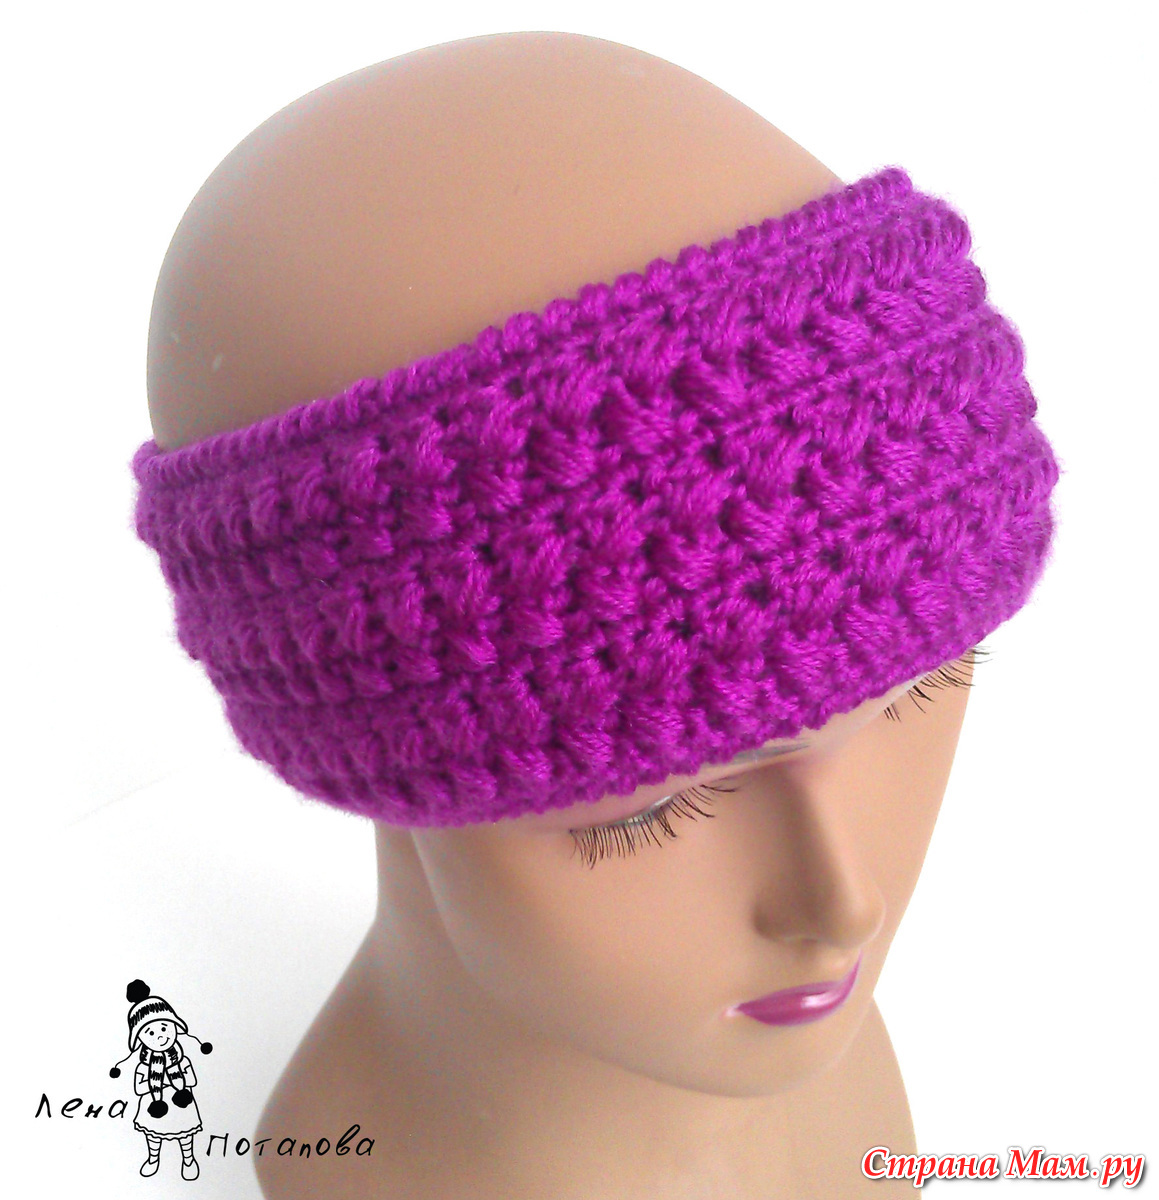 Теплая повязка на голову крючком для девочки схема фото